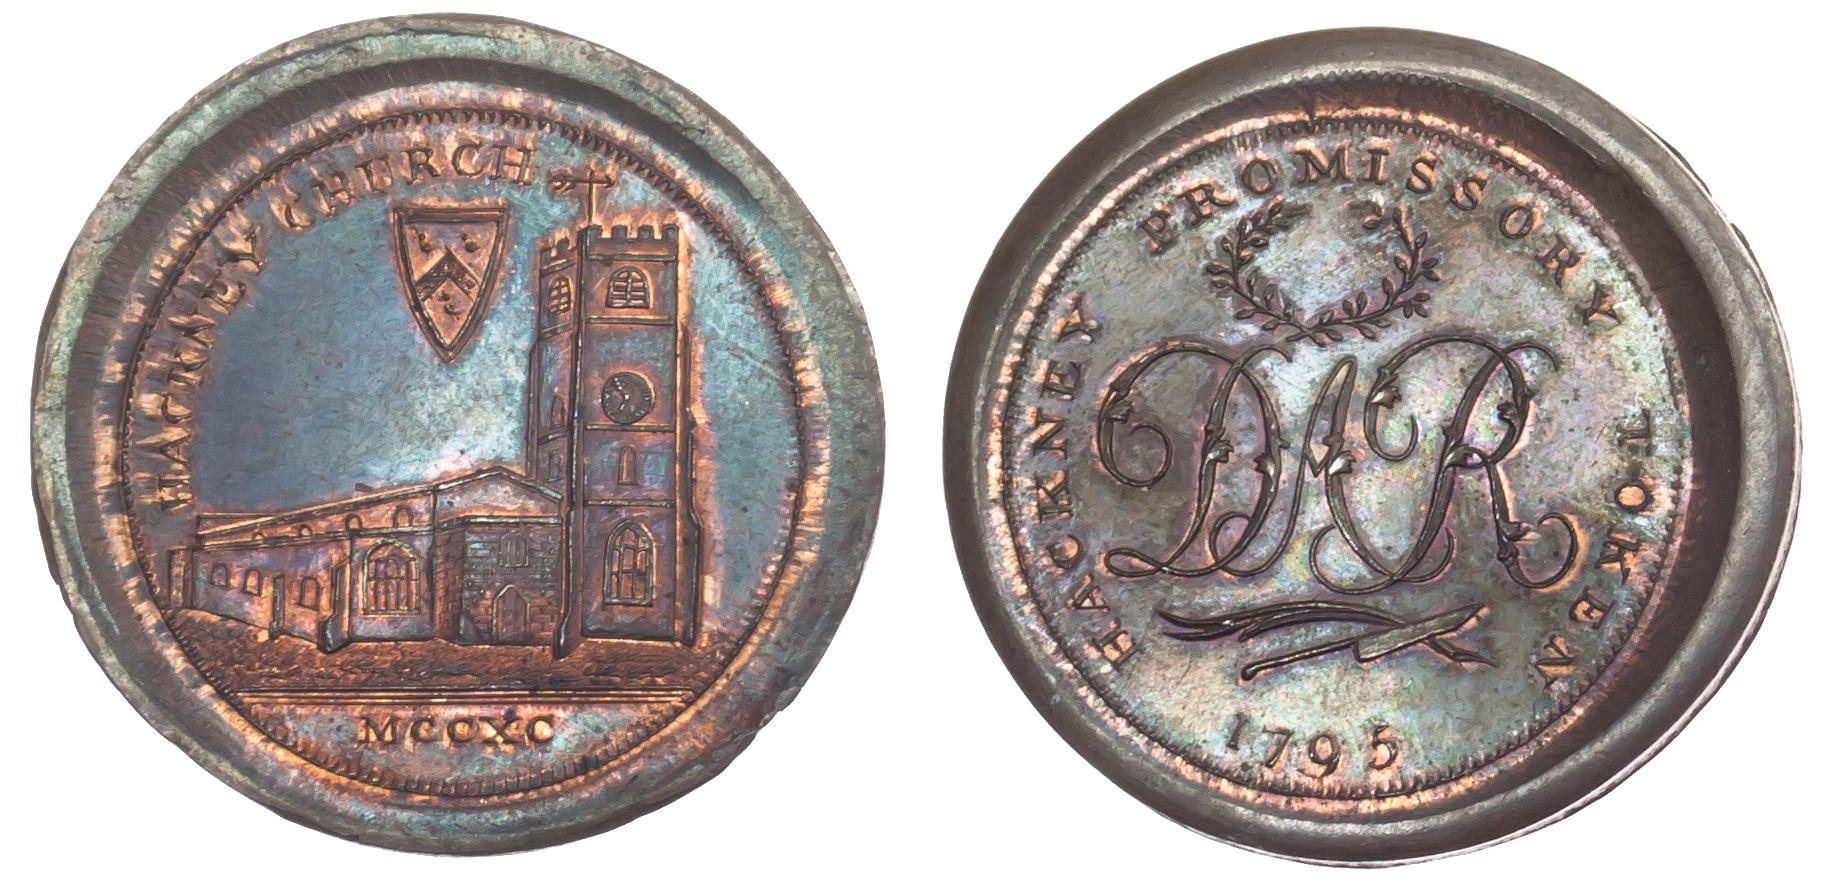 Hackney, David Rebello, Skidmore's Penny Token, 1795